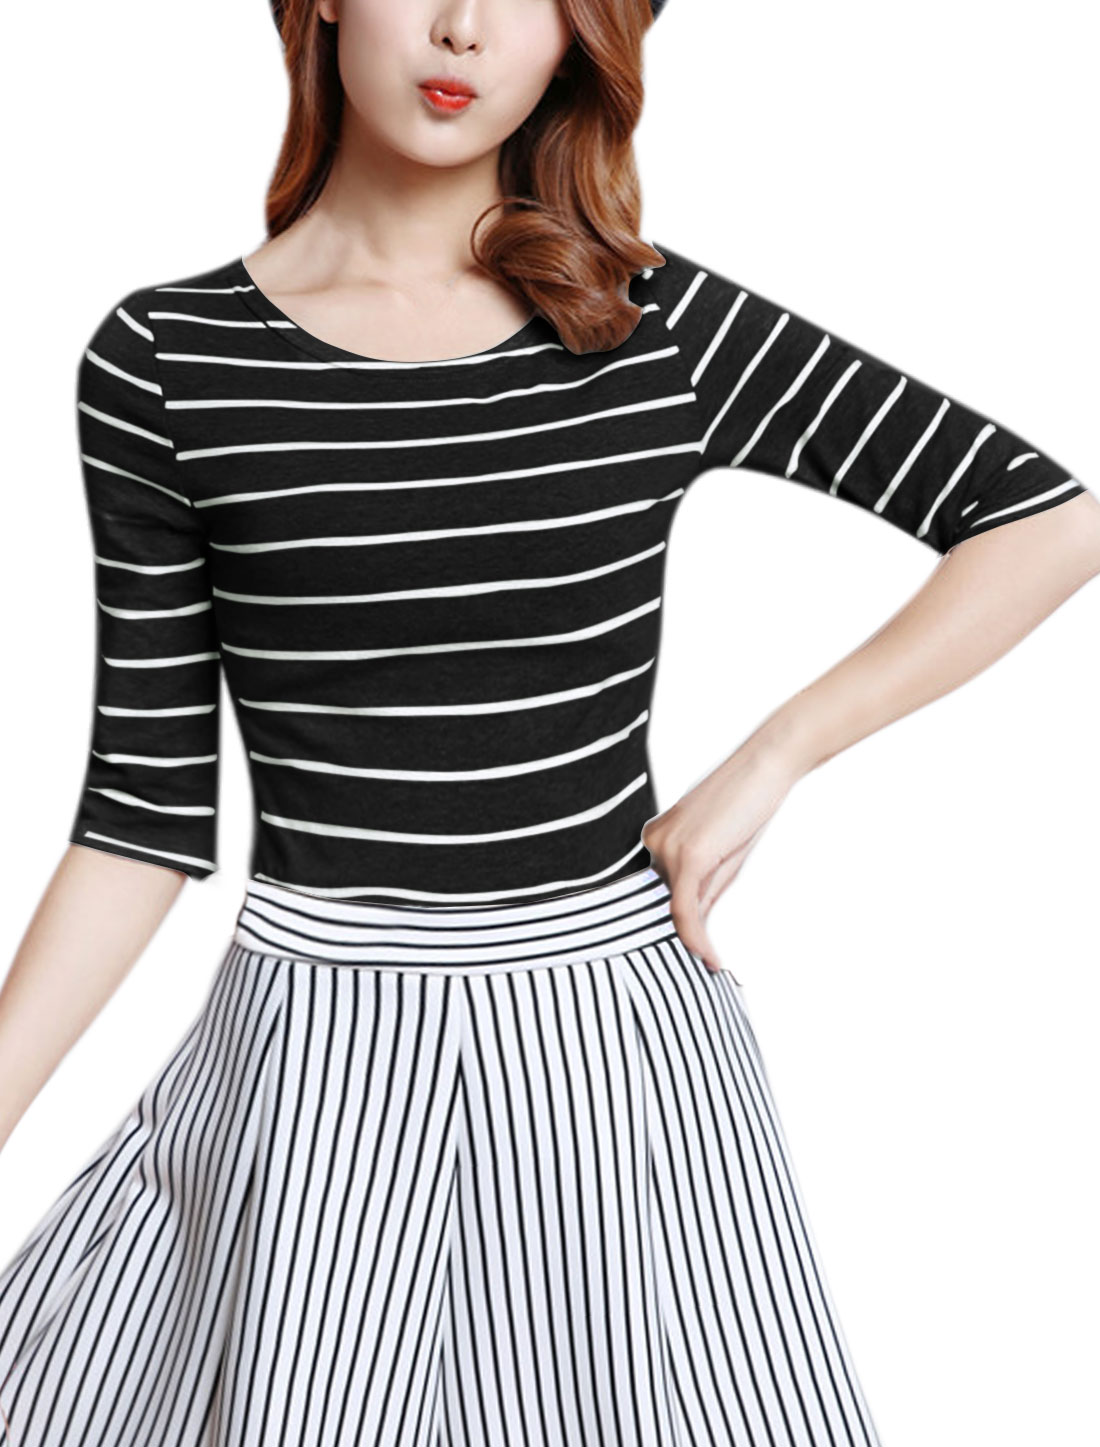 Women Elbow Sleeves Round Neck Slim Fit Stripe T-Shirt Black S